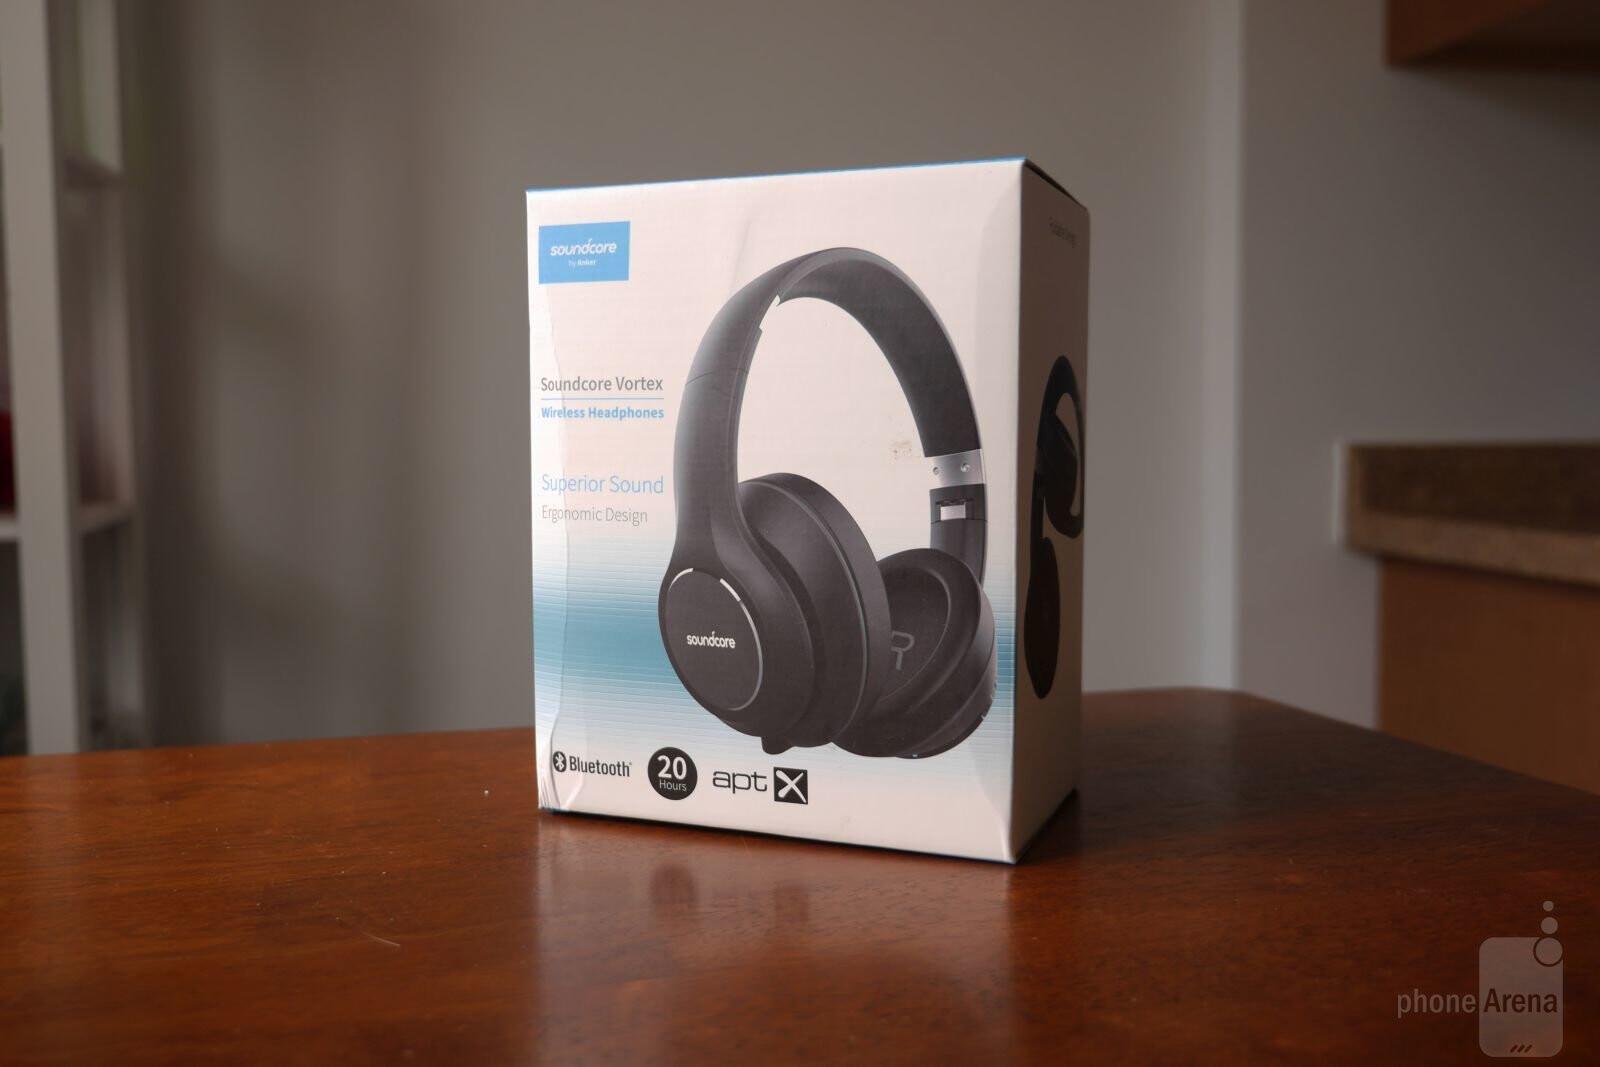 d94a243ff5b Anker Soundcore Vortex hands-on Review | PhoneArena reviews - PhoneArena